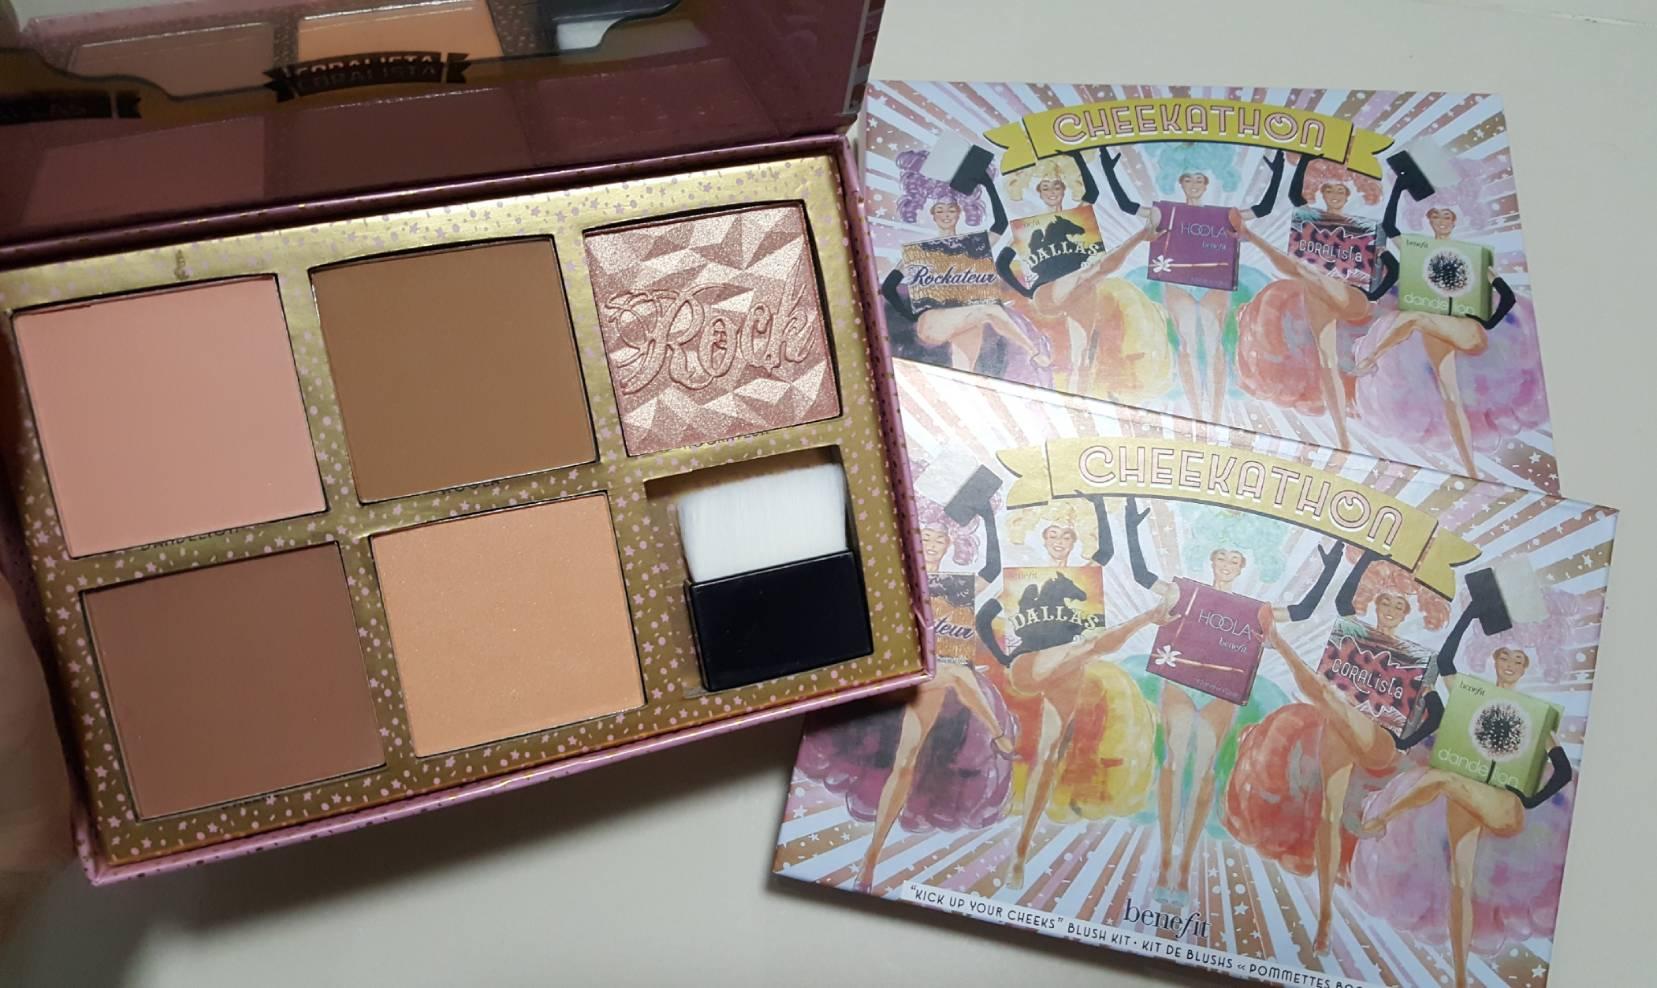 Benefit Cheekathon Blush Palette Limited Edition พาเลตนี้ รวมความดังของบลัชสีฮิต จาก Benefit